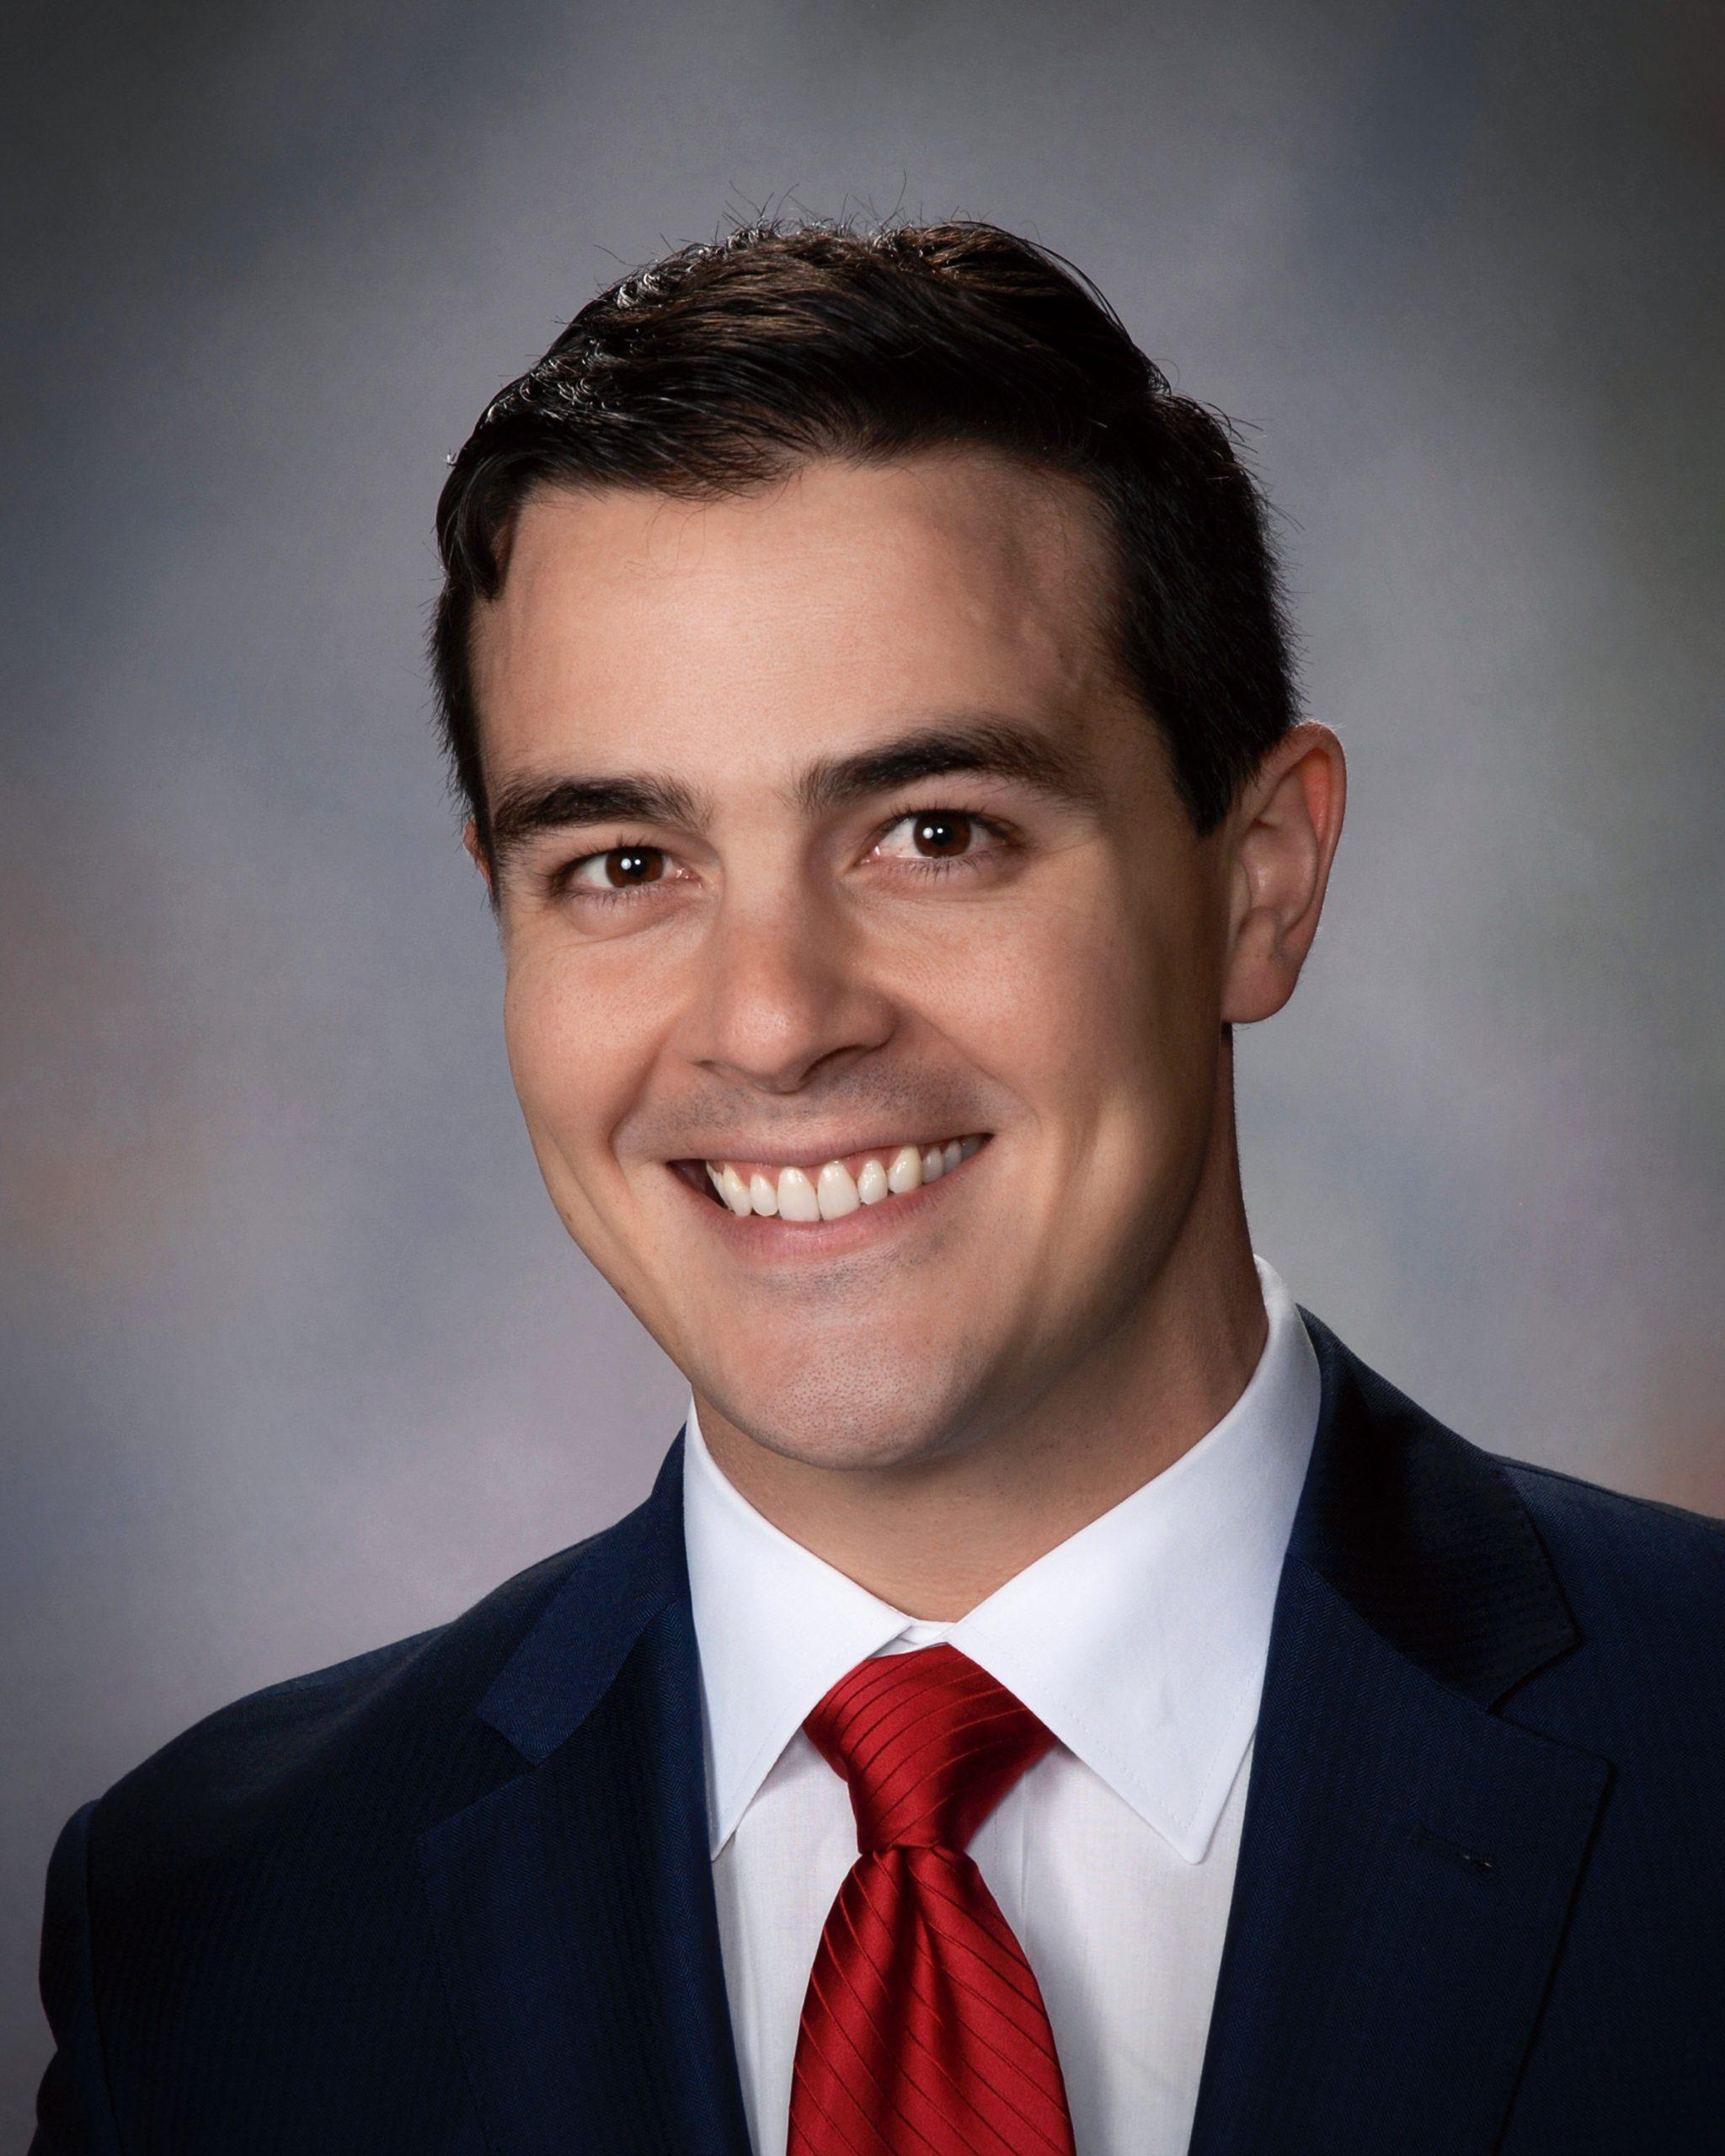 John J. DeLuca, Jr